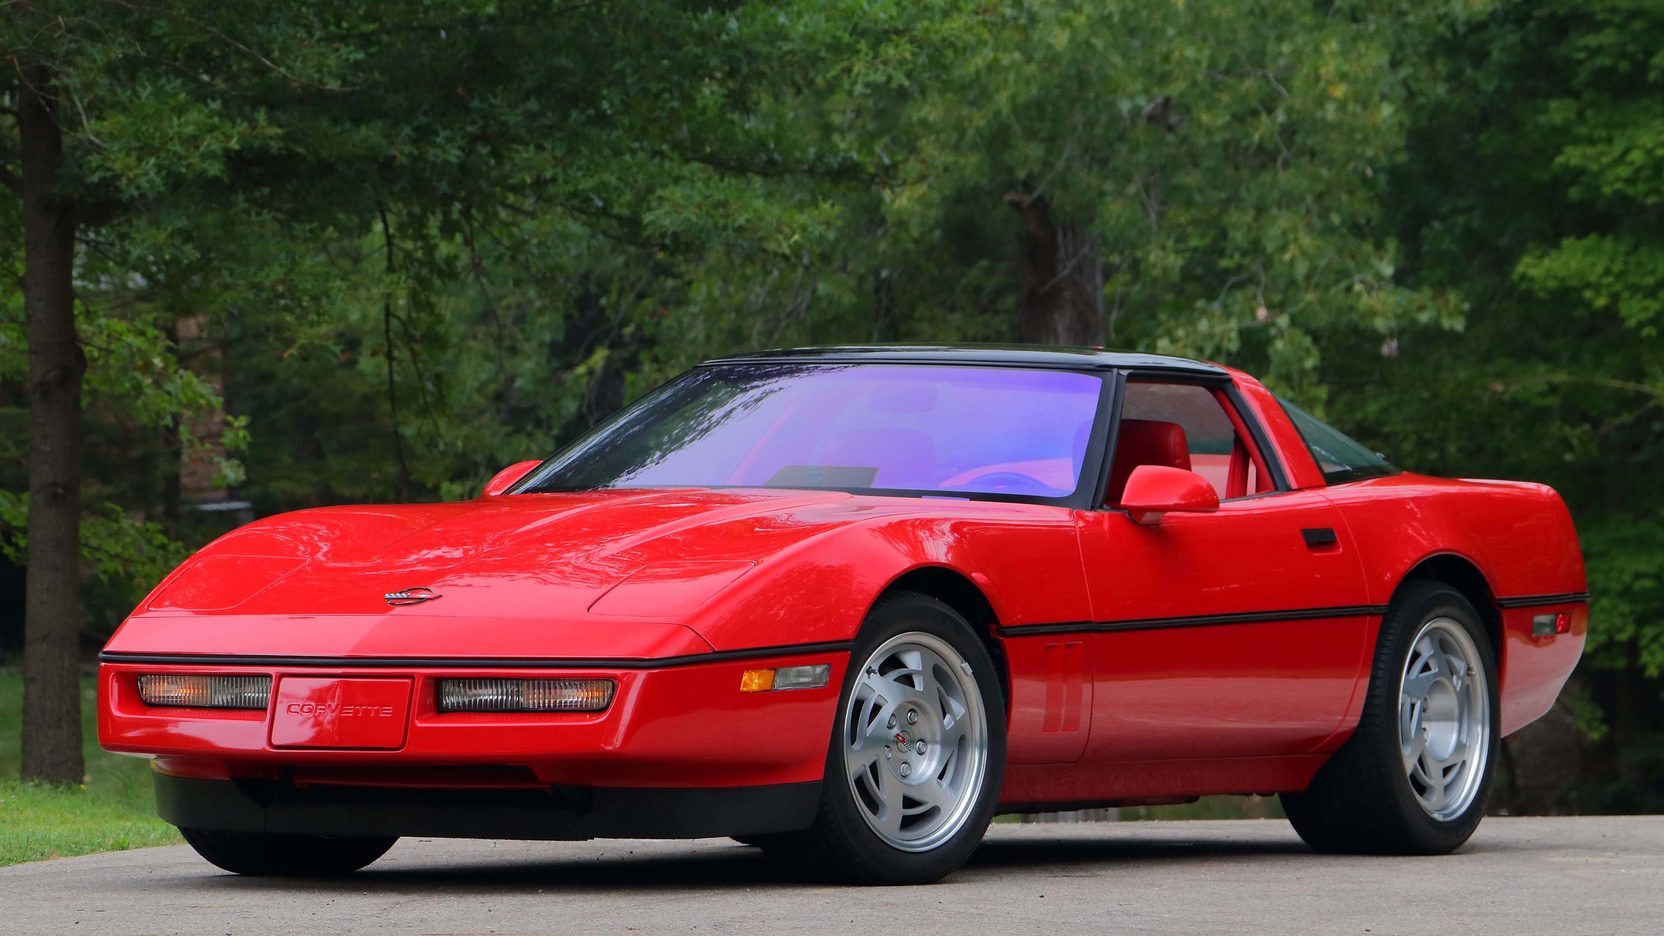 1990 Chevy Corvette ZR1